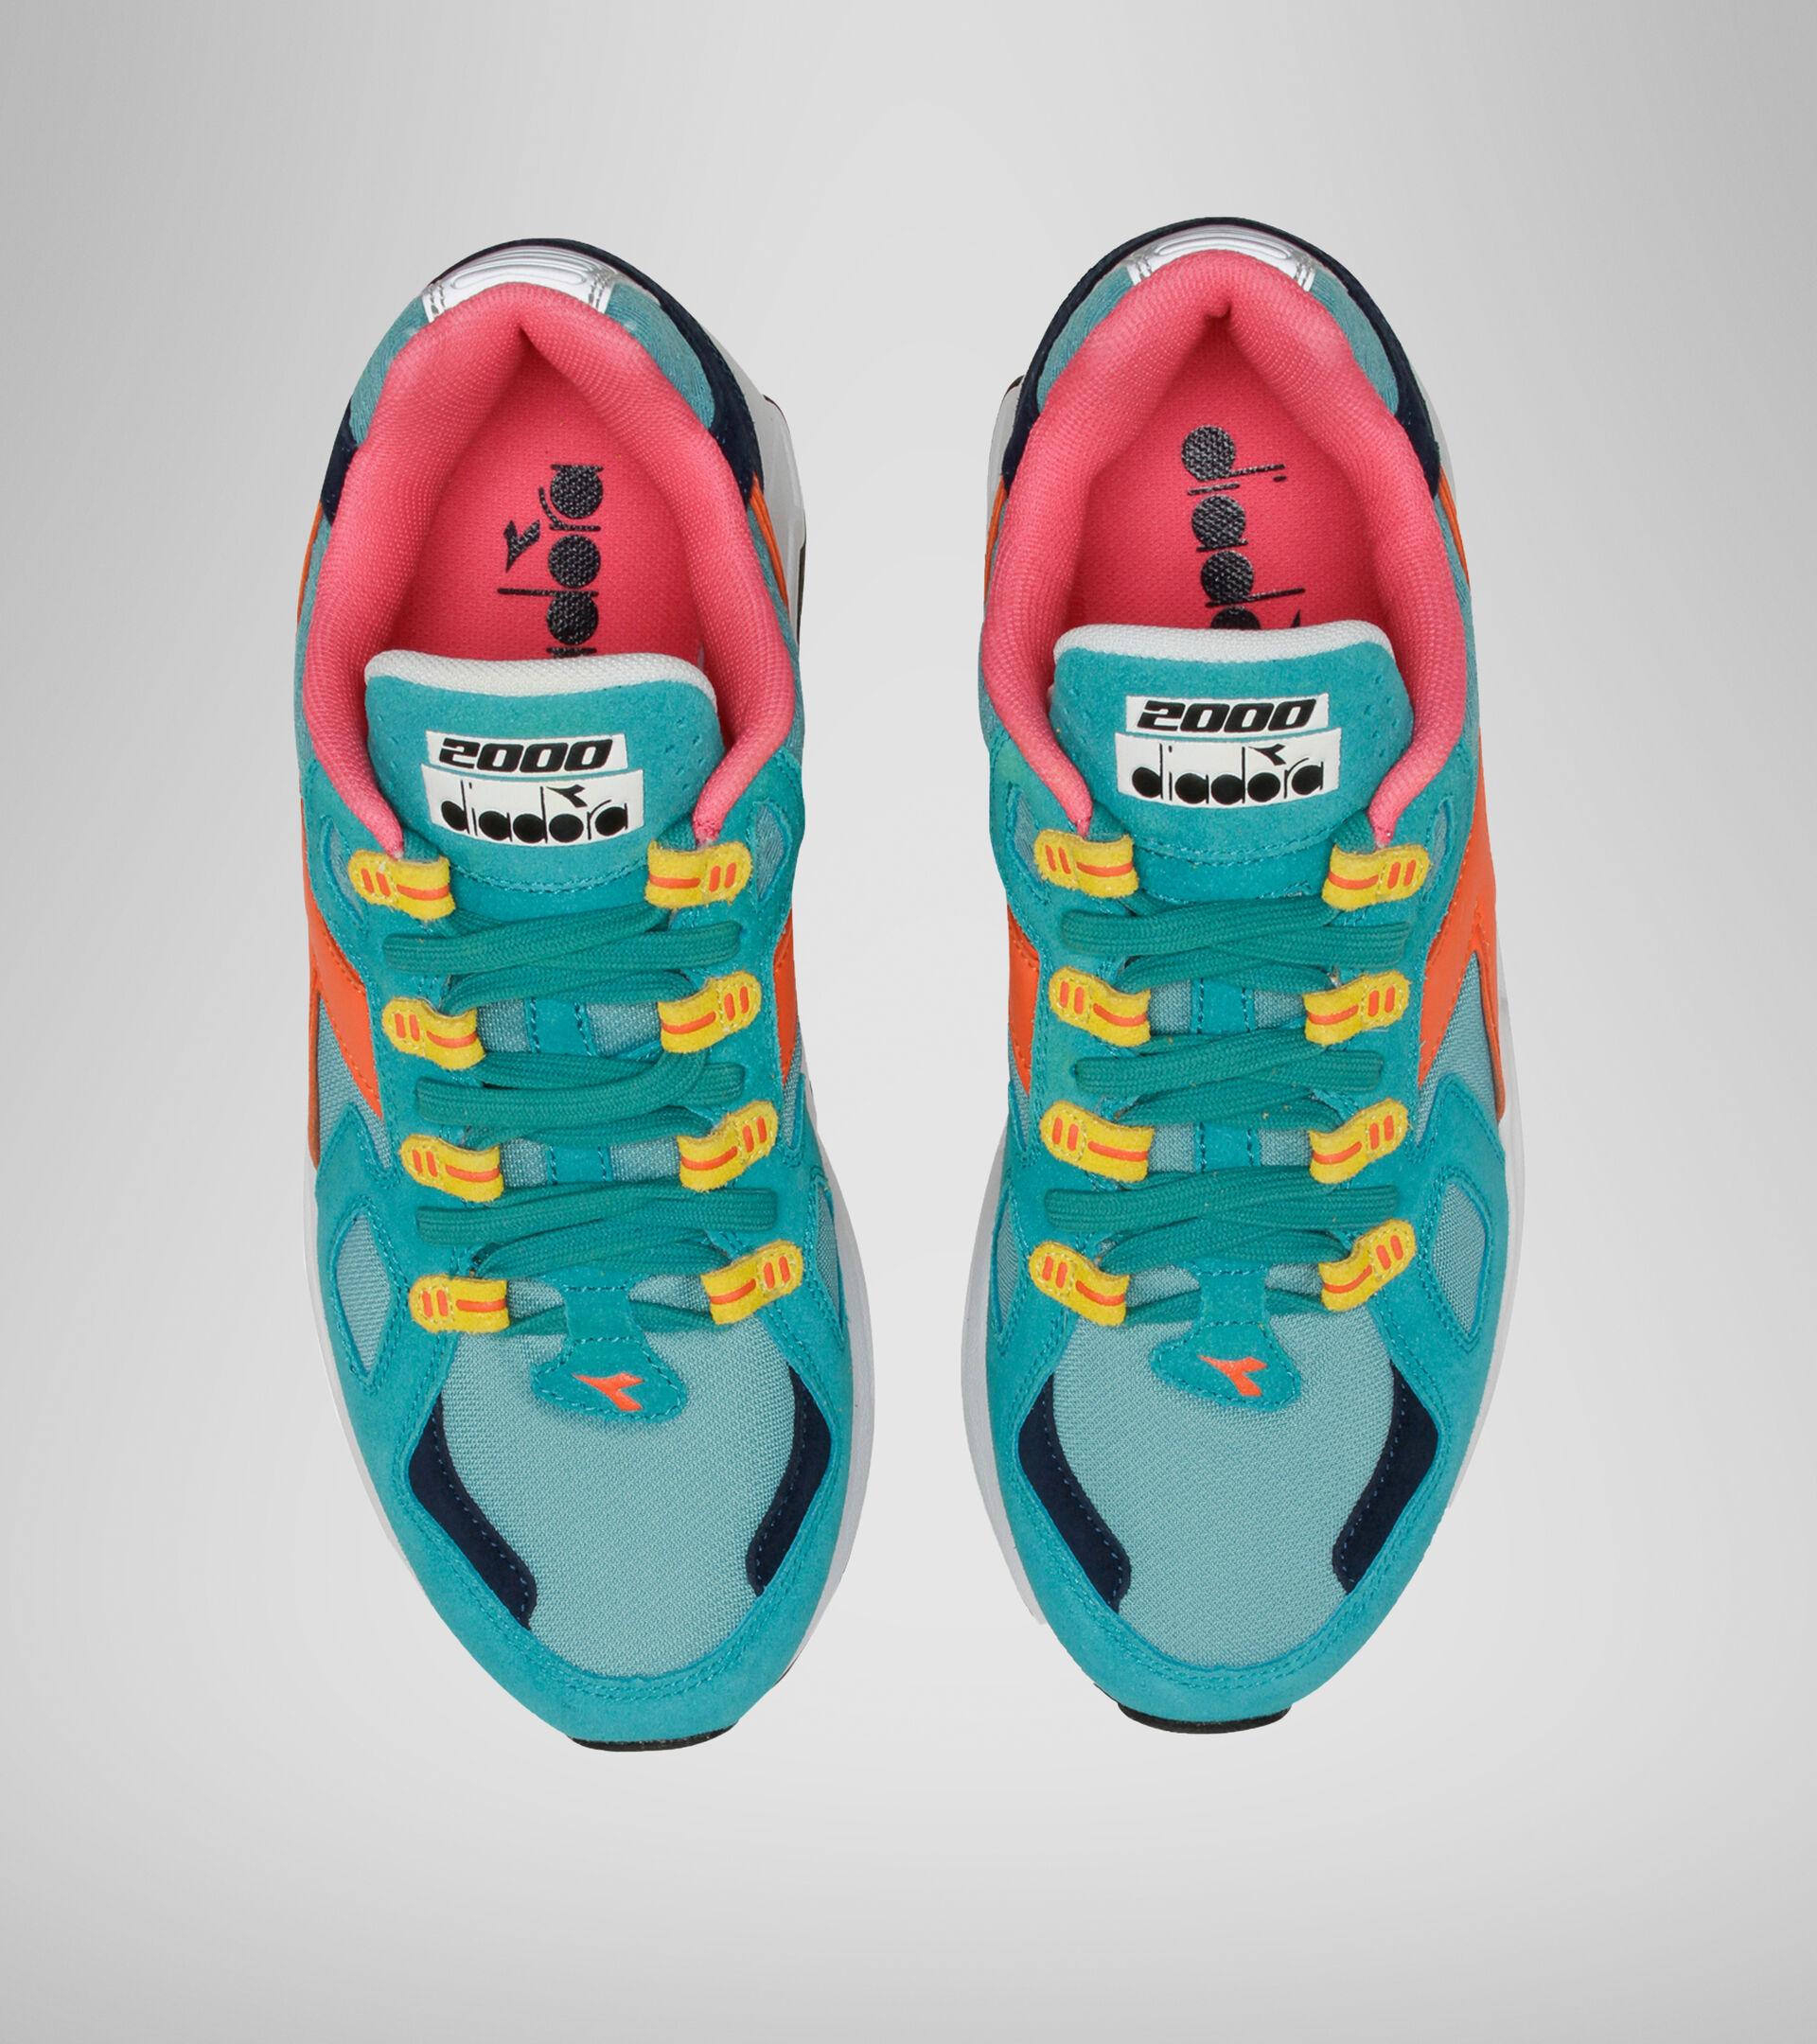 Footwear Sportswear UOMO MYTHOS OUTDOOR VERDE VIRIDIAN Diadora